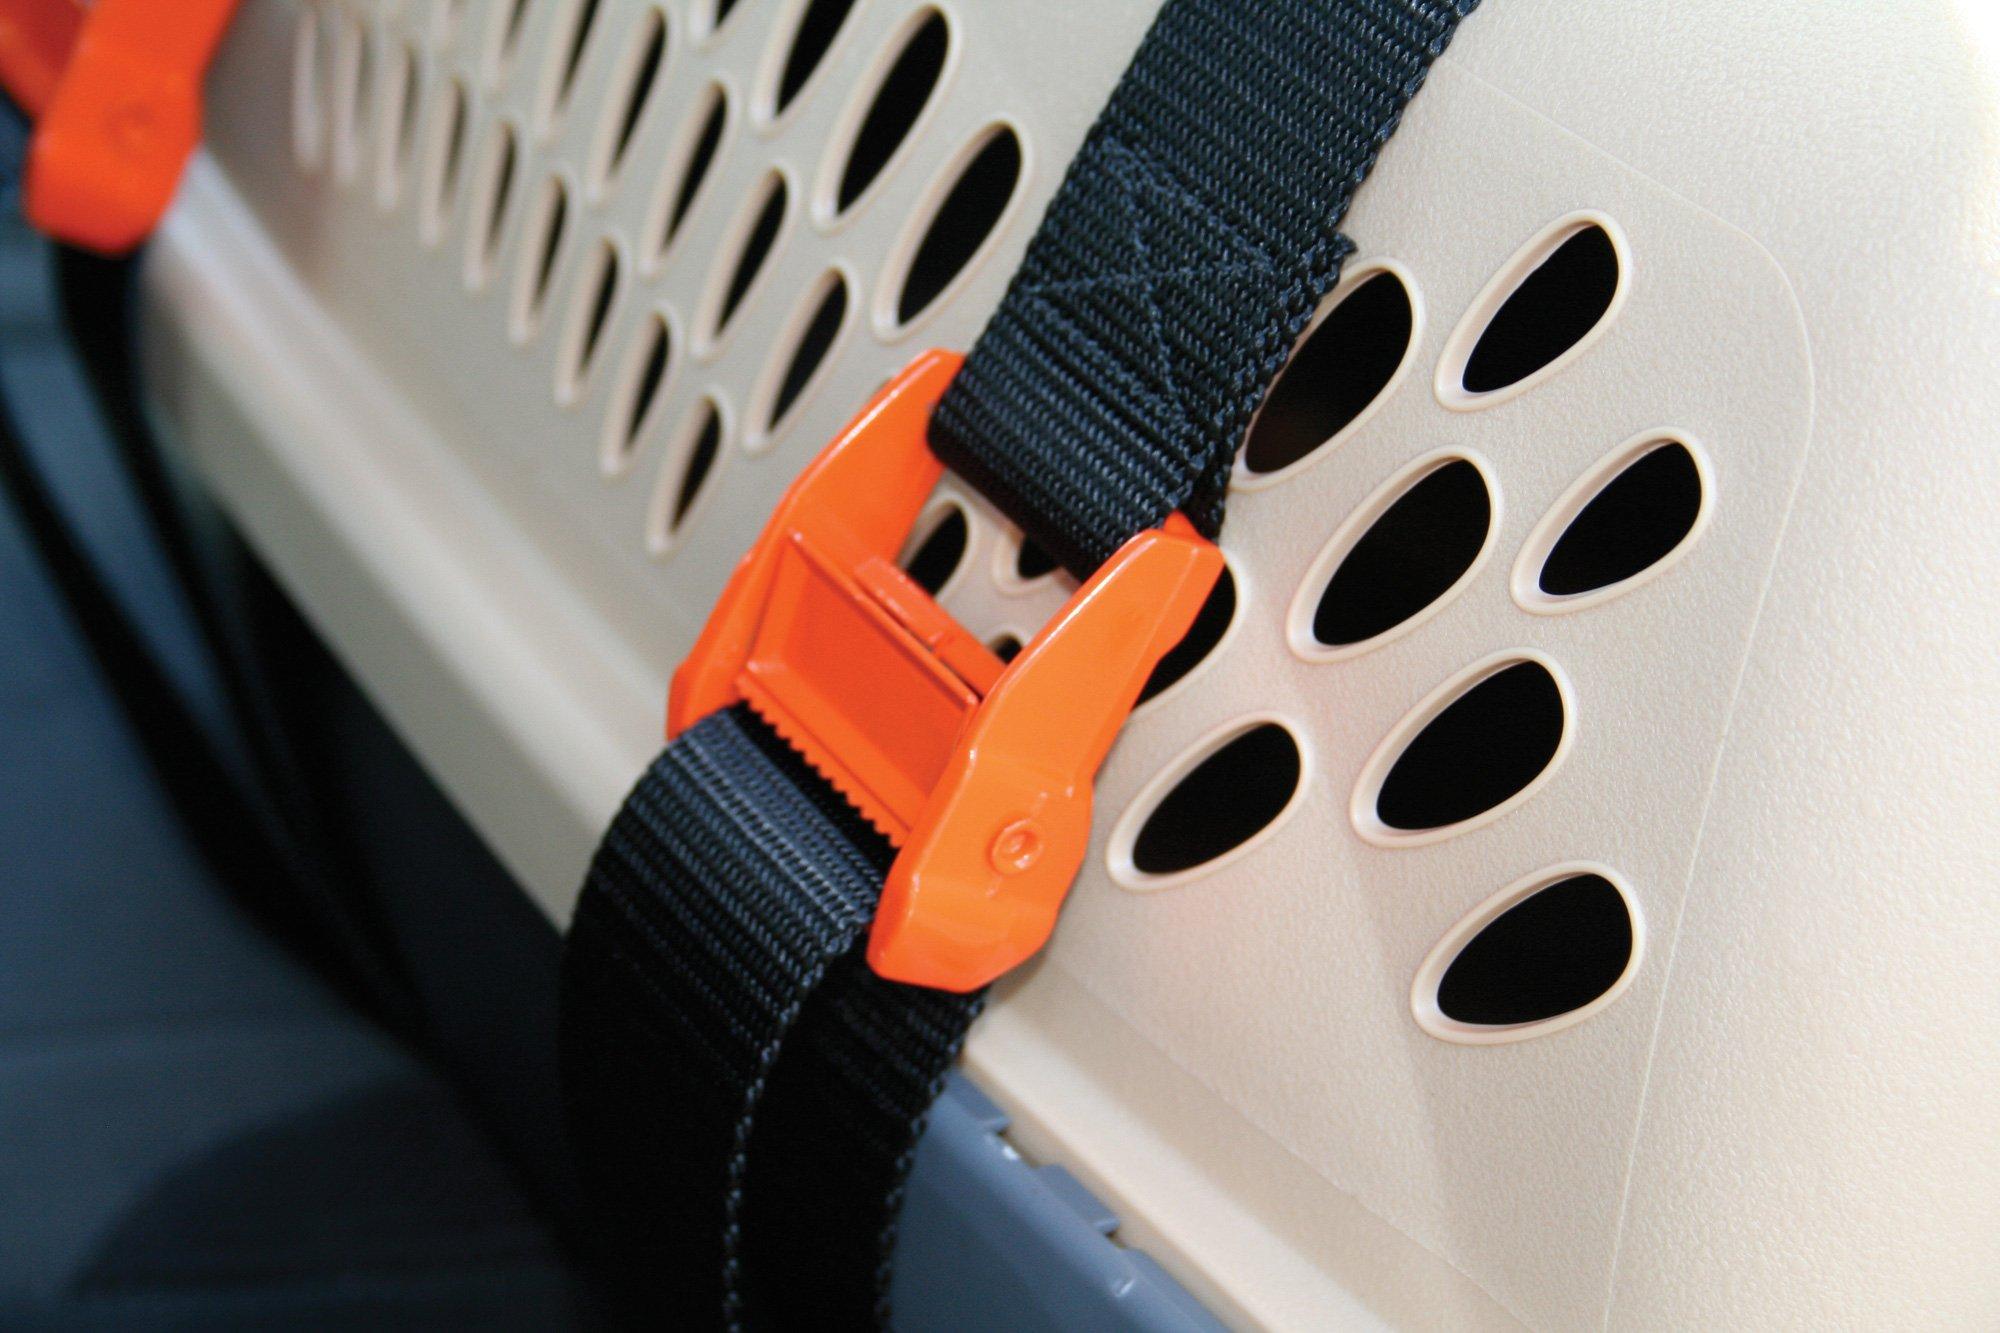 Kurgo Dog Carrier Keeper , Pet Car Seat Carrier Strap, Black (Carrier Not Included)